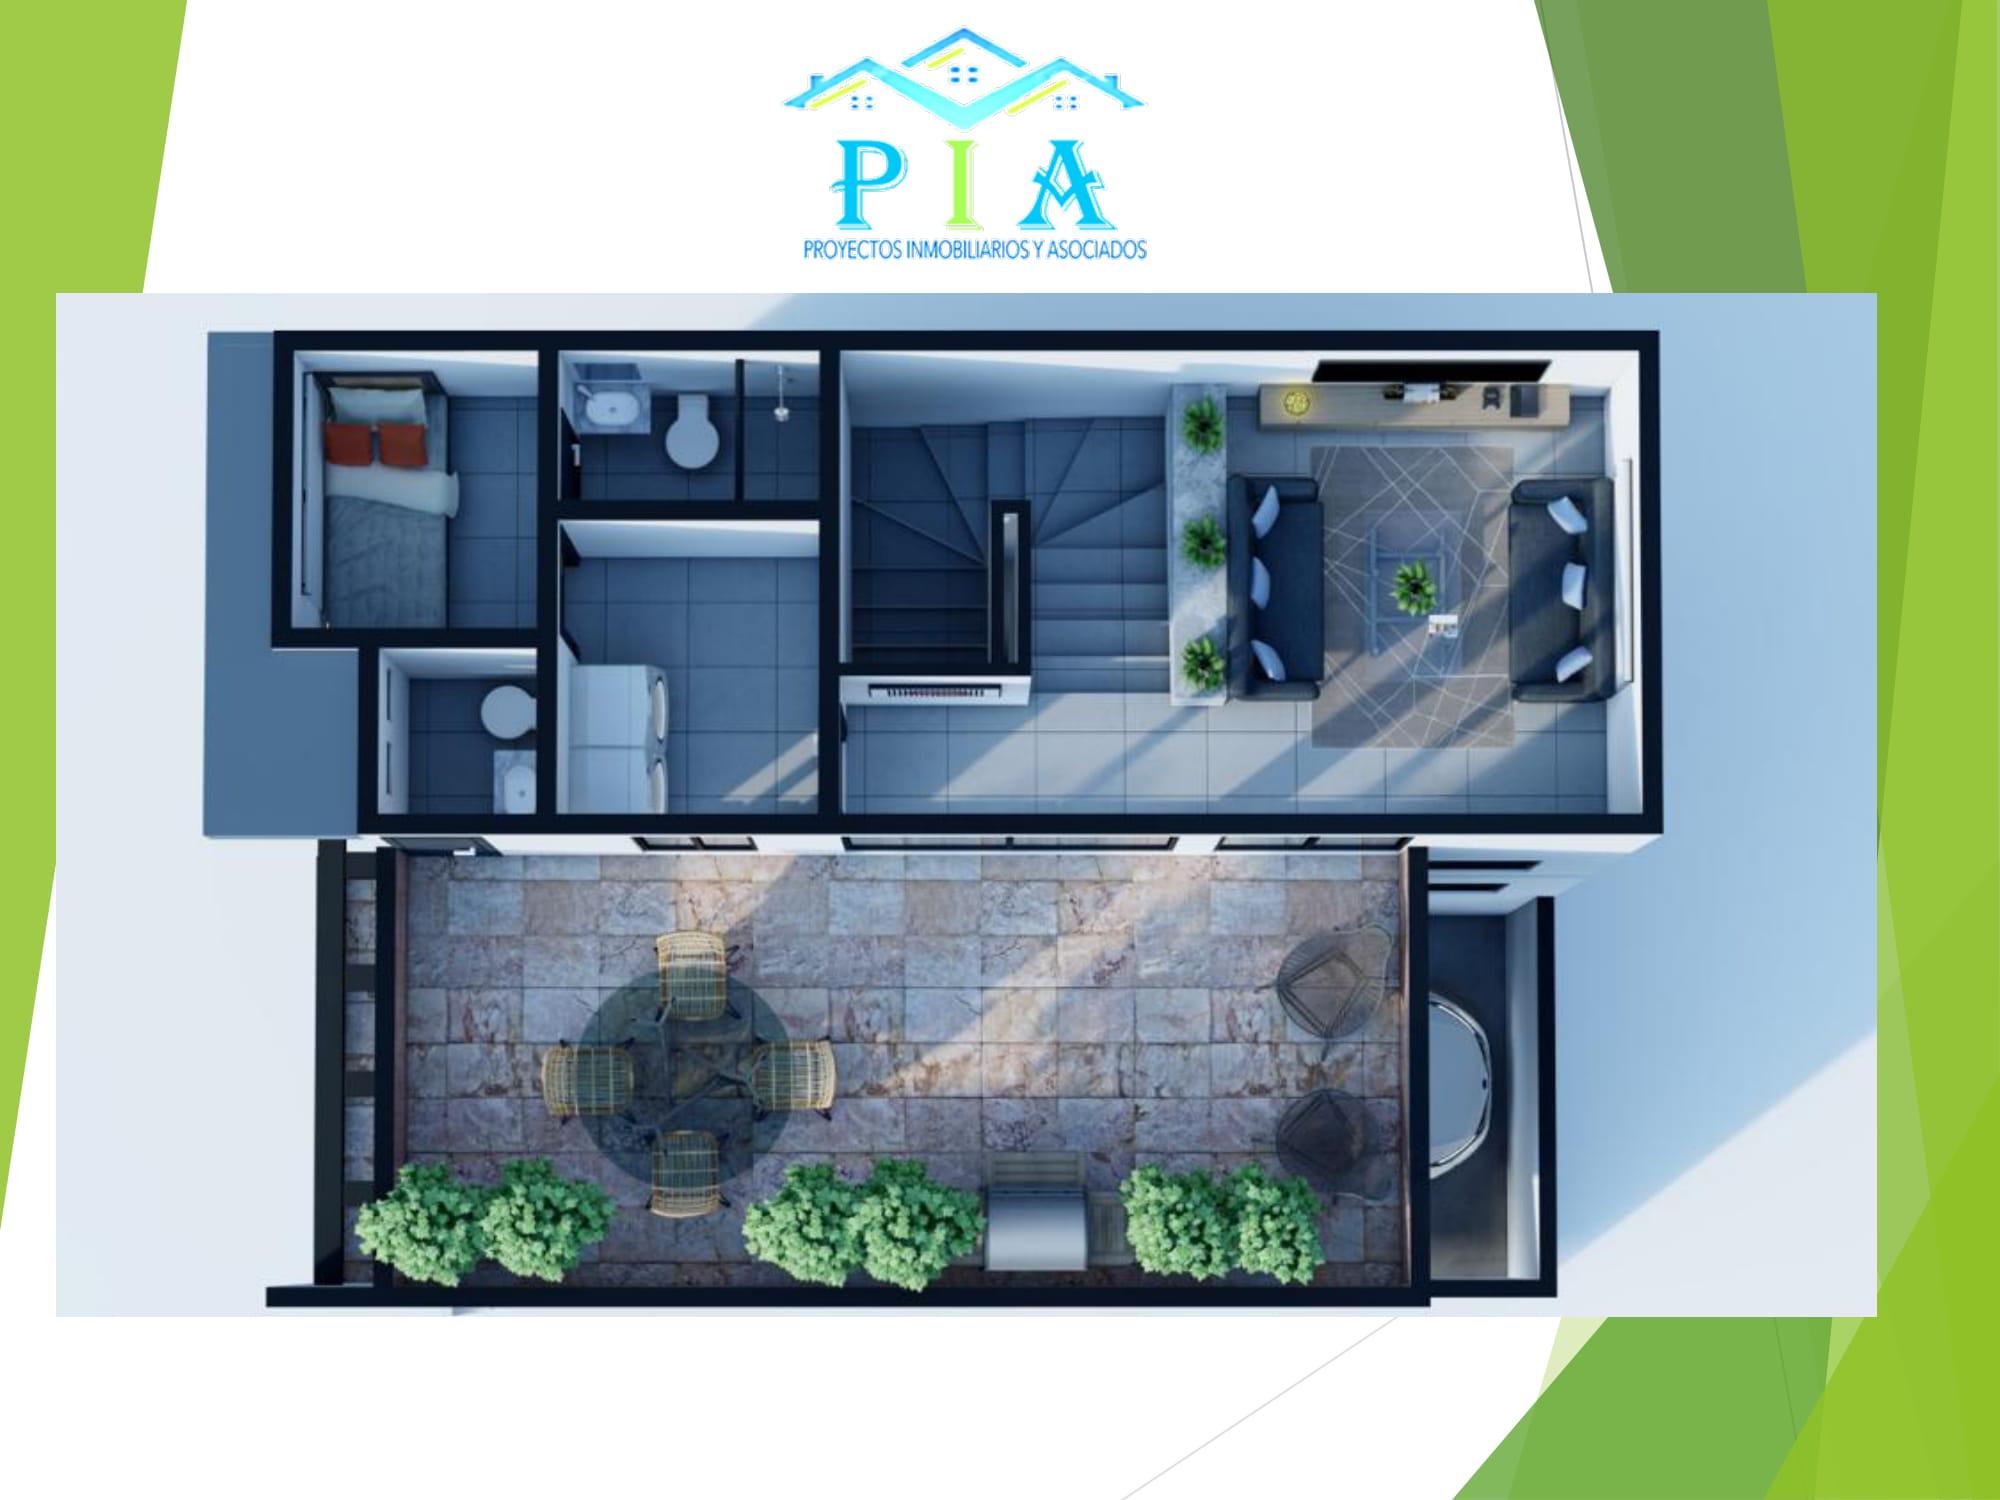 https://0201.nccdn.net/1_2/000/000/123/e70/venta-residencial-teya-5.jpg